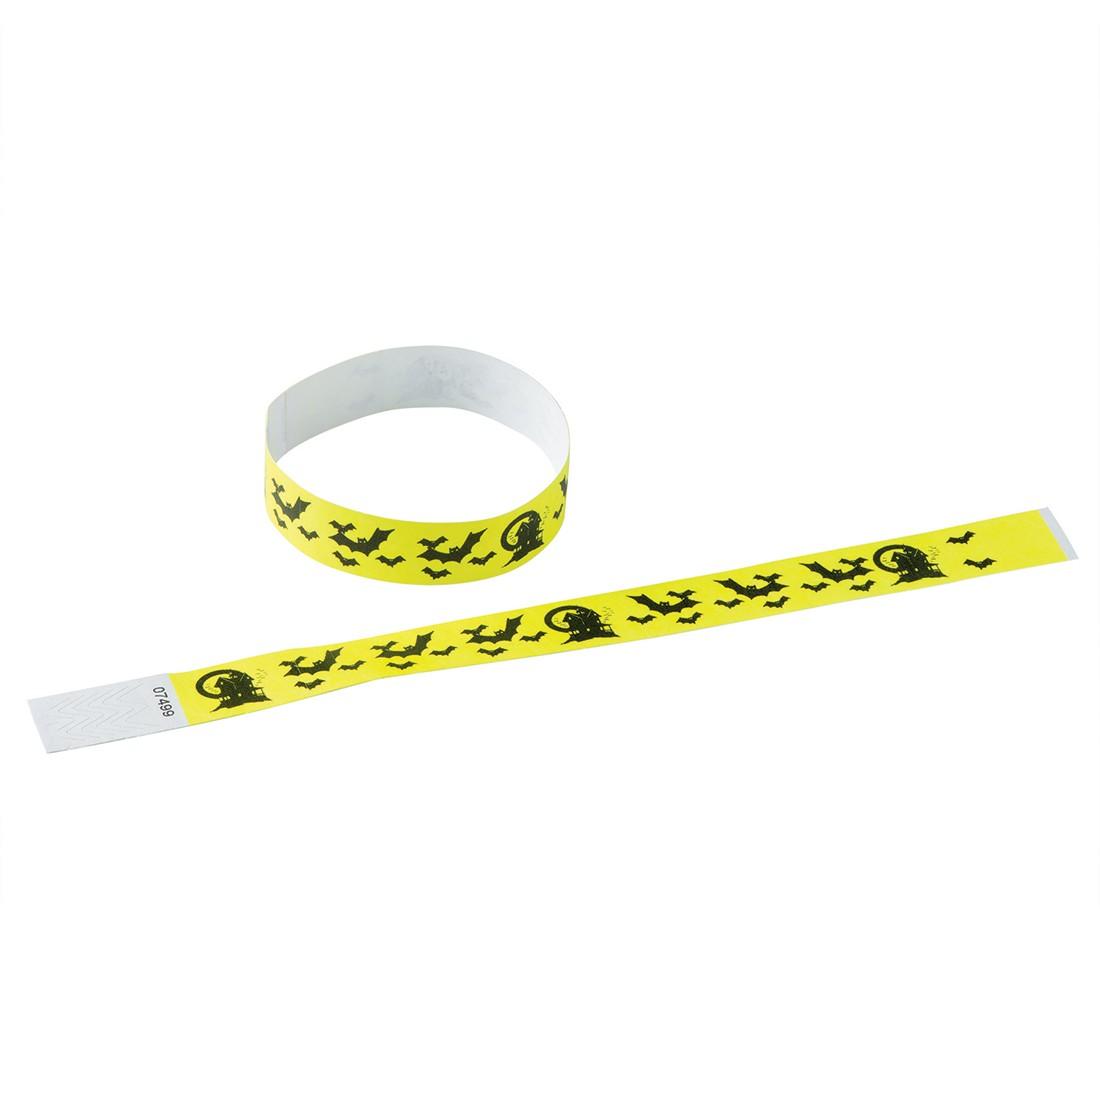 Halloween Adhesive Wristbands [image]